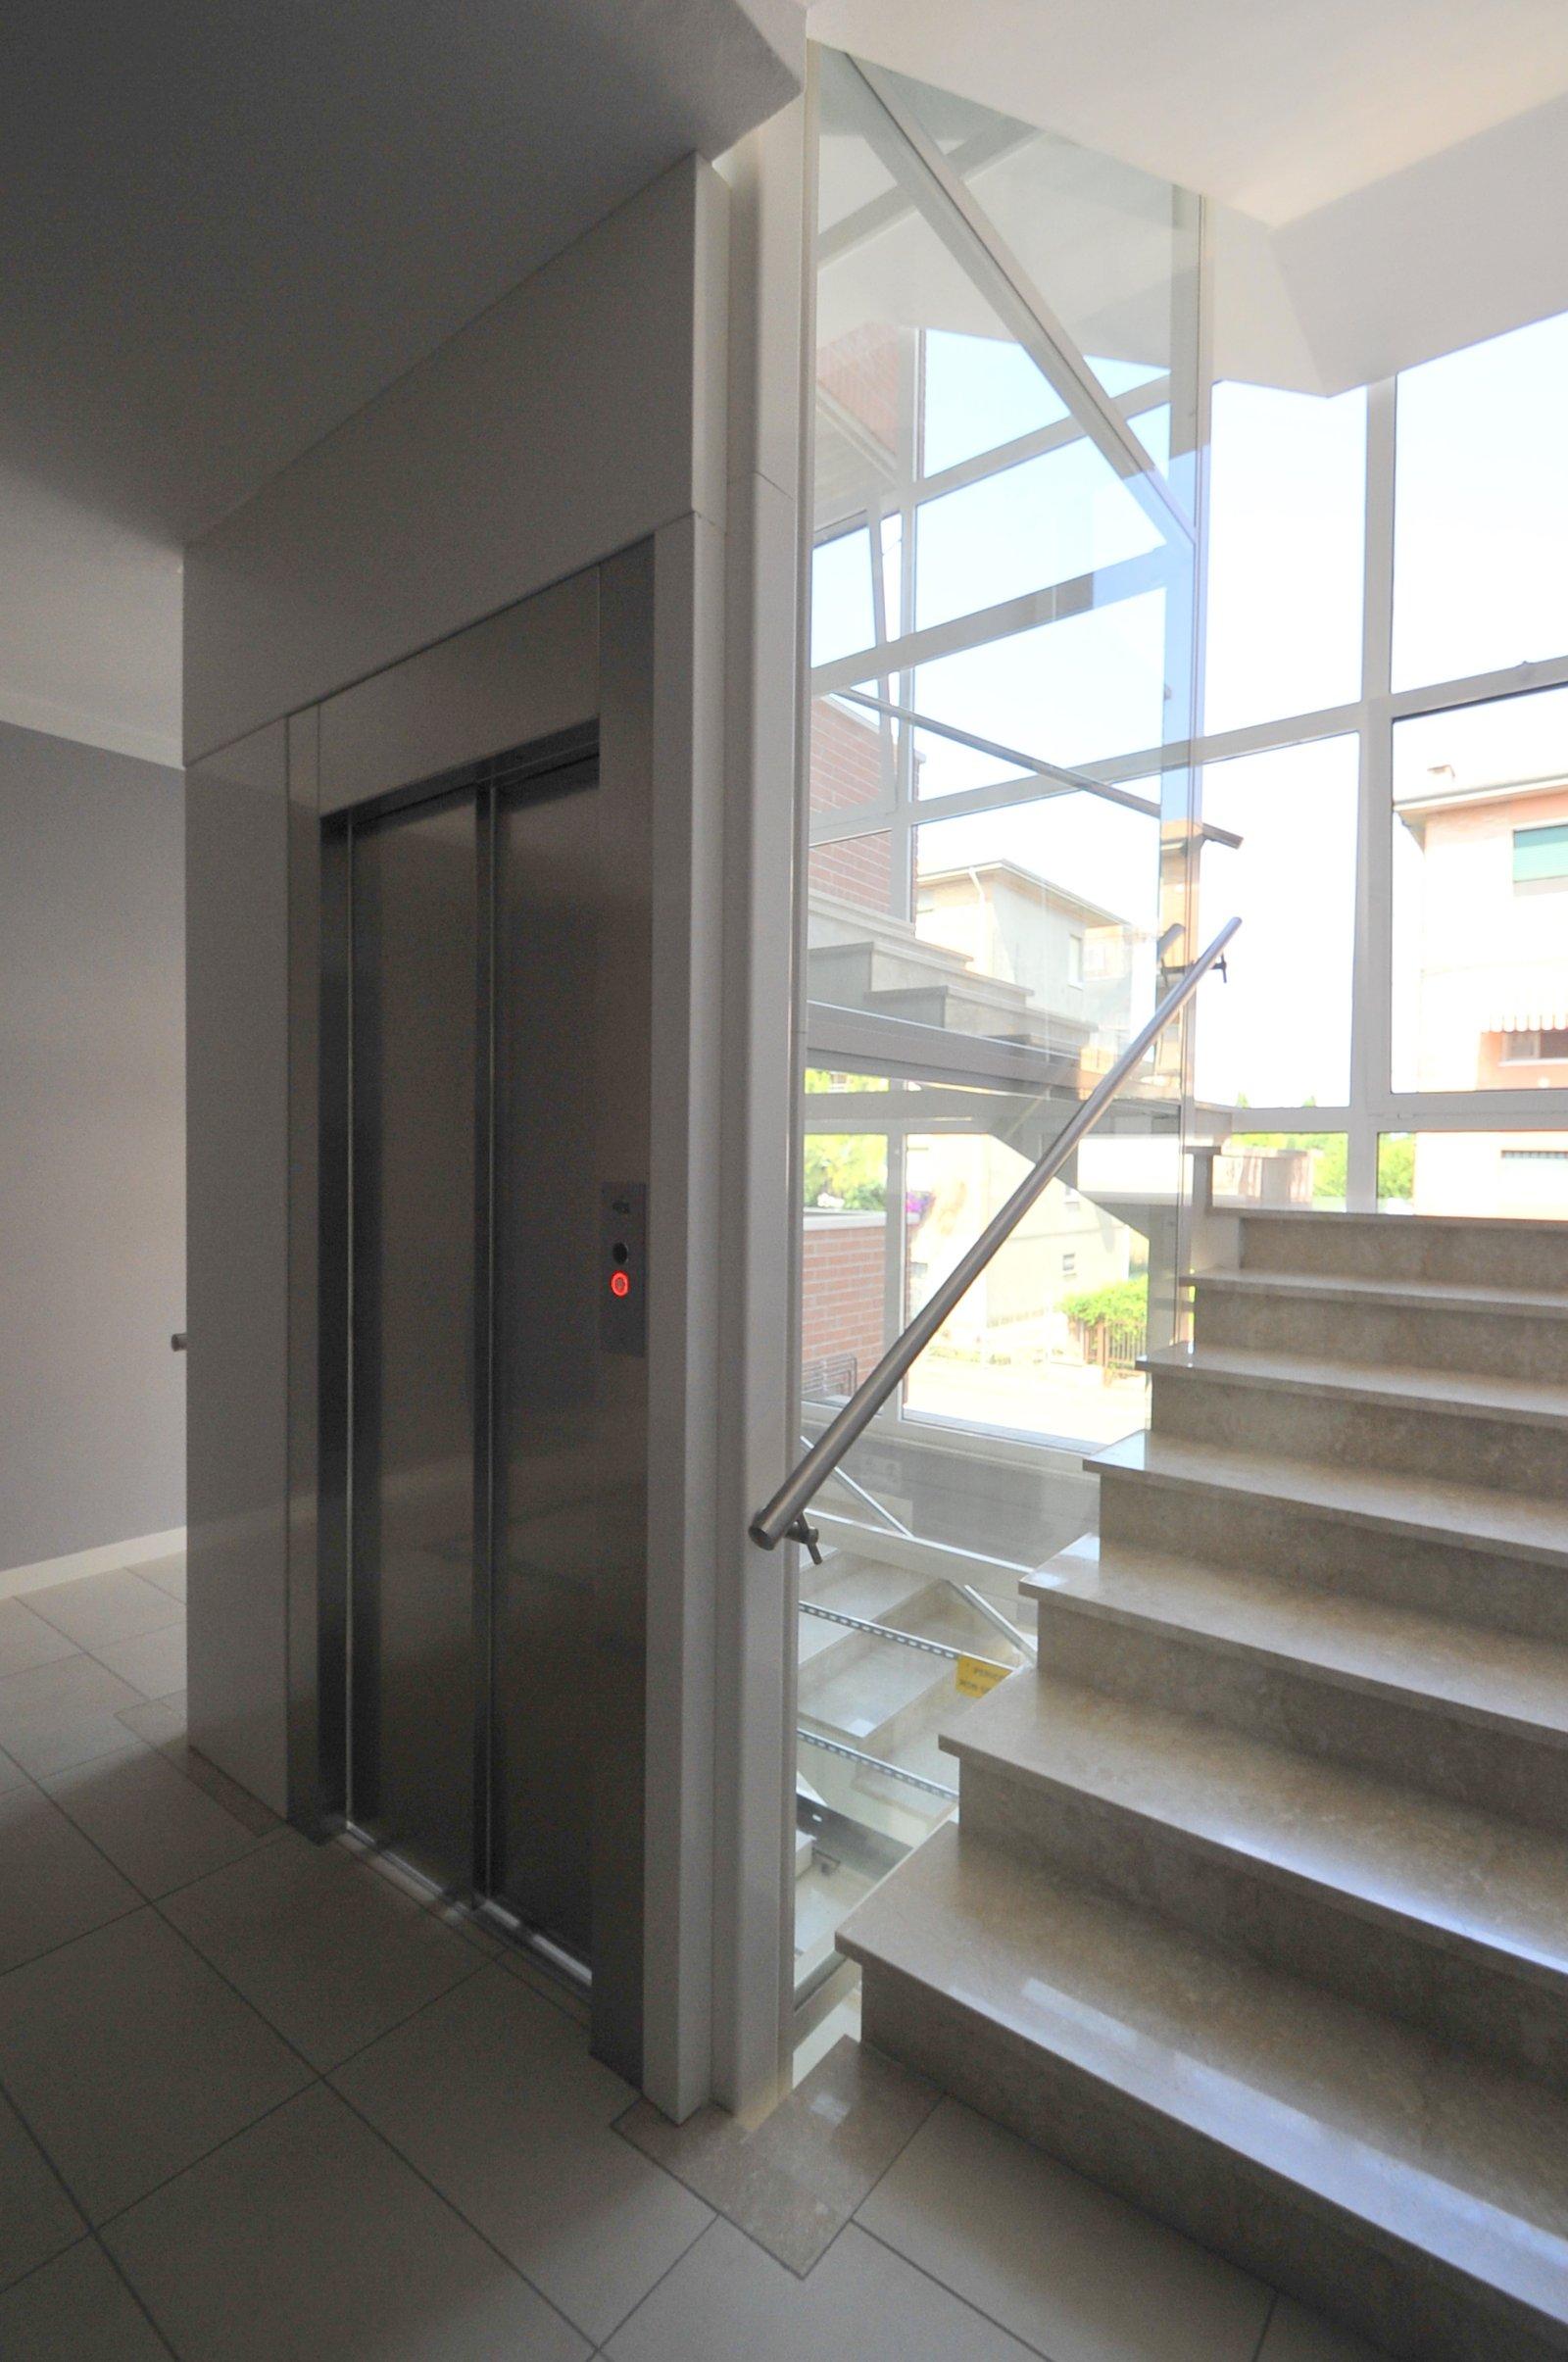 Installazione E Manutenzione Ascensori A Ferrara